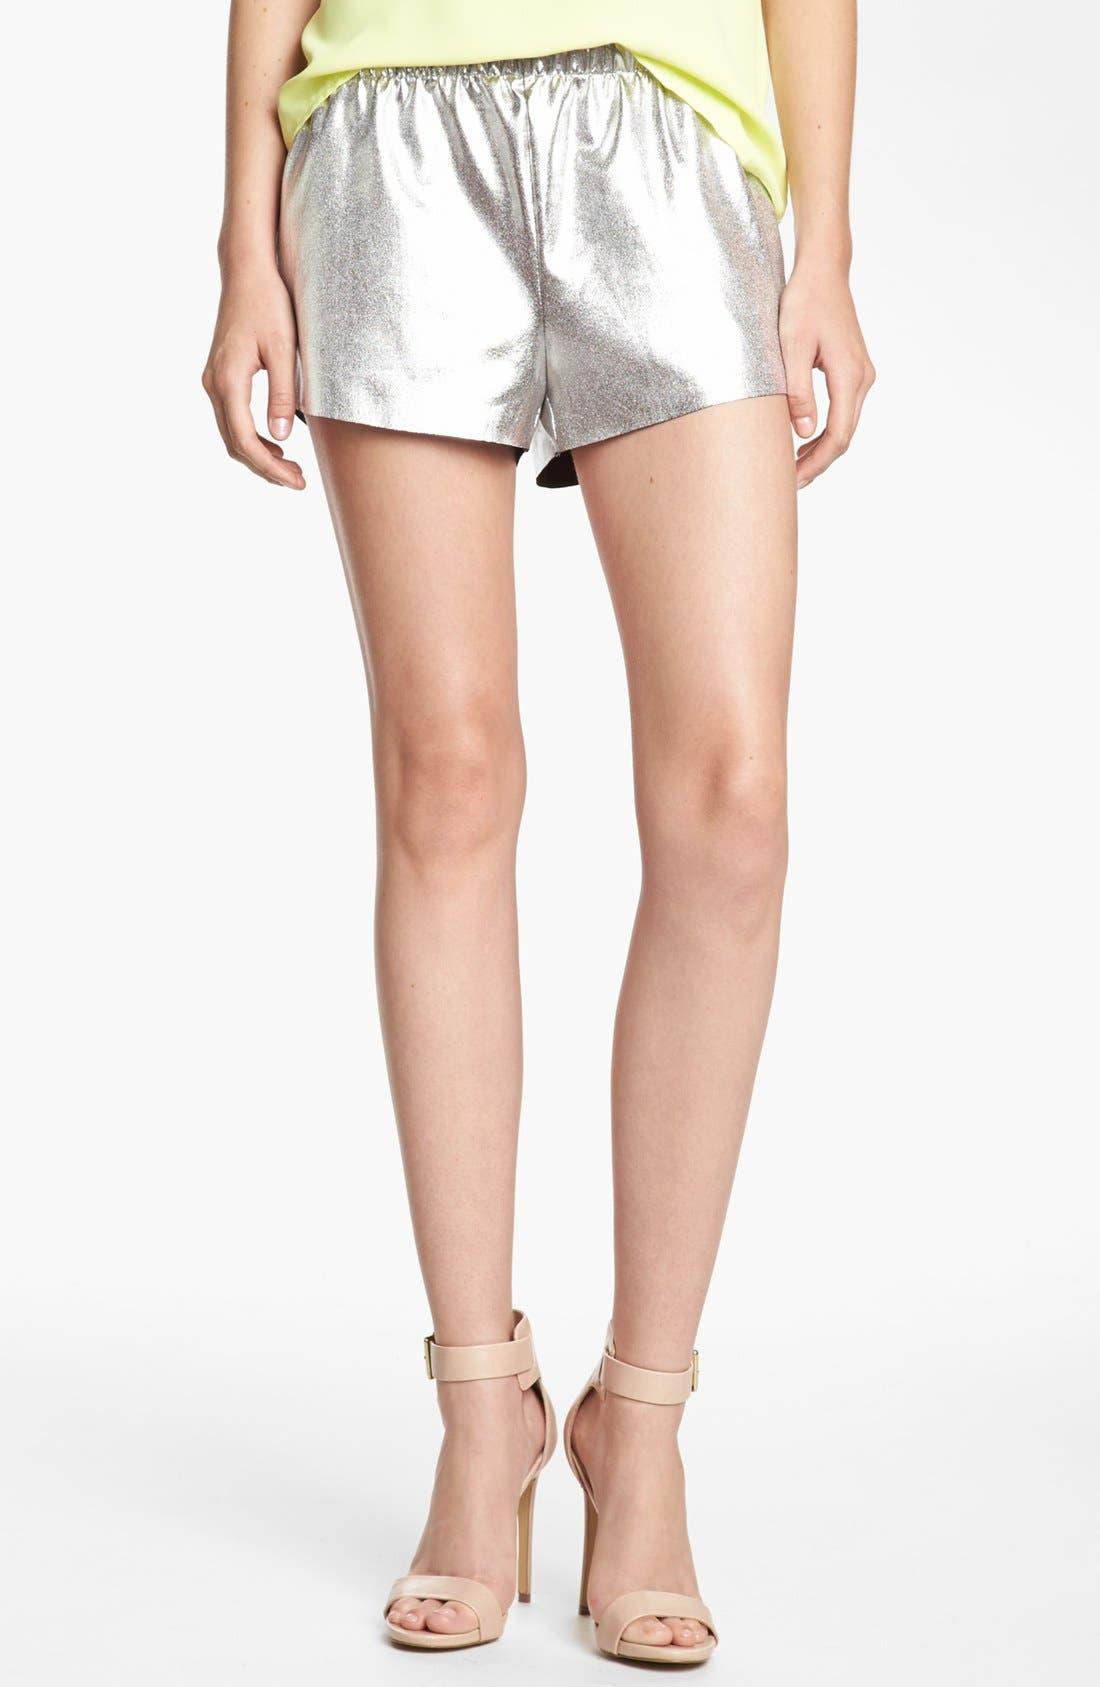 LEITH, 'Cosmic' Metallic Tap Shorts, Main thumbnail 1, color, 040